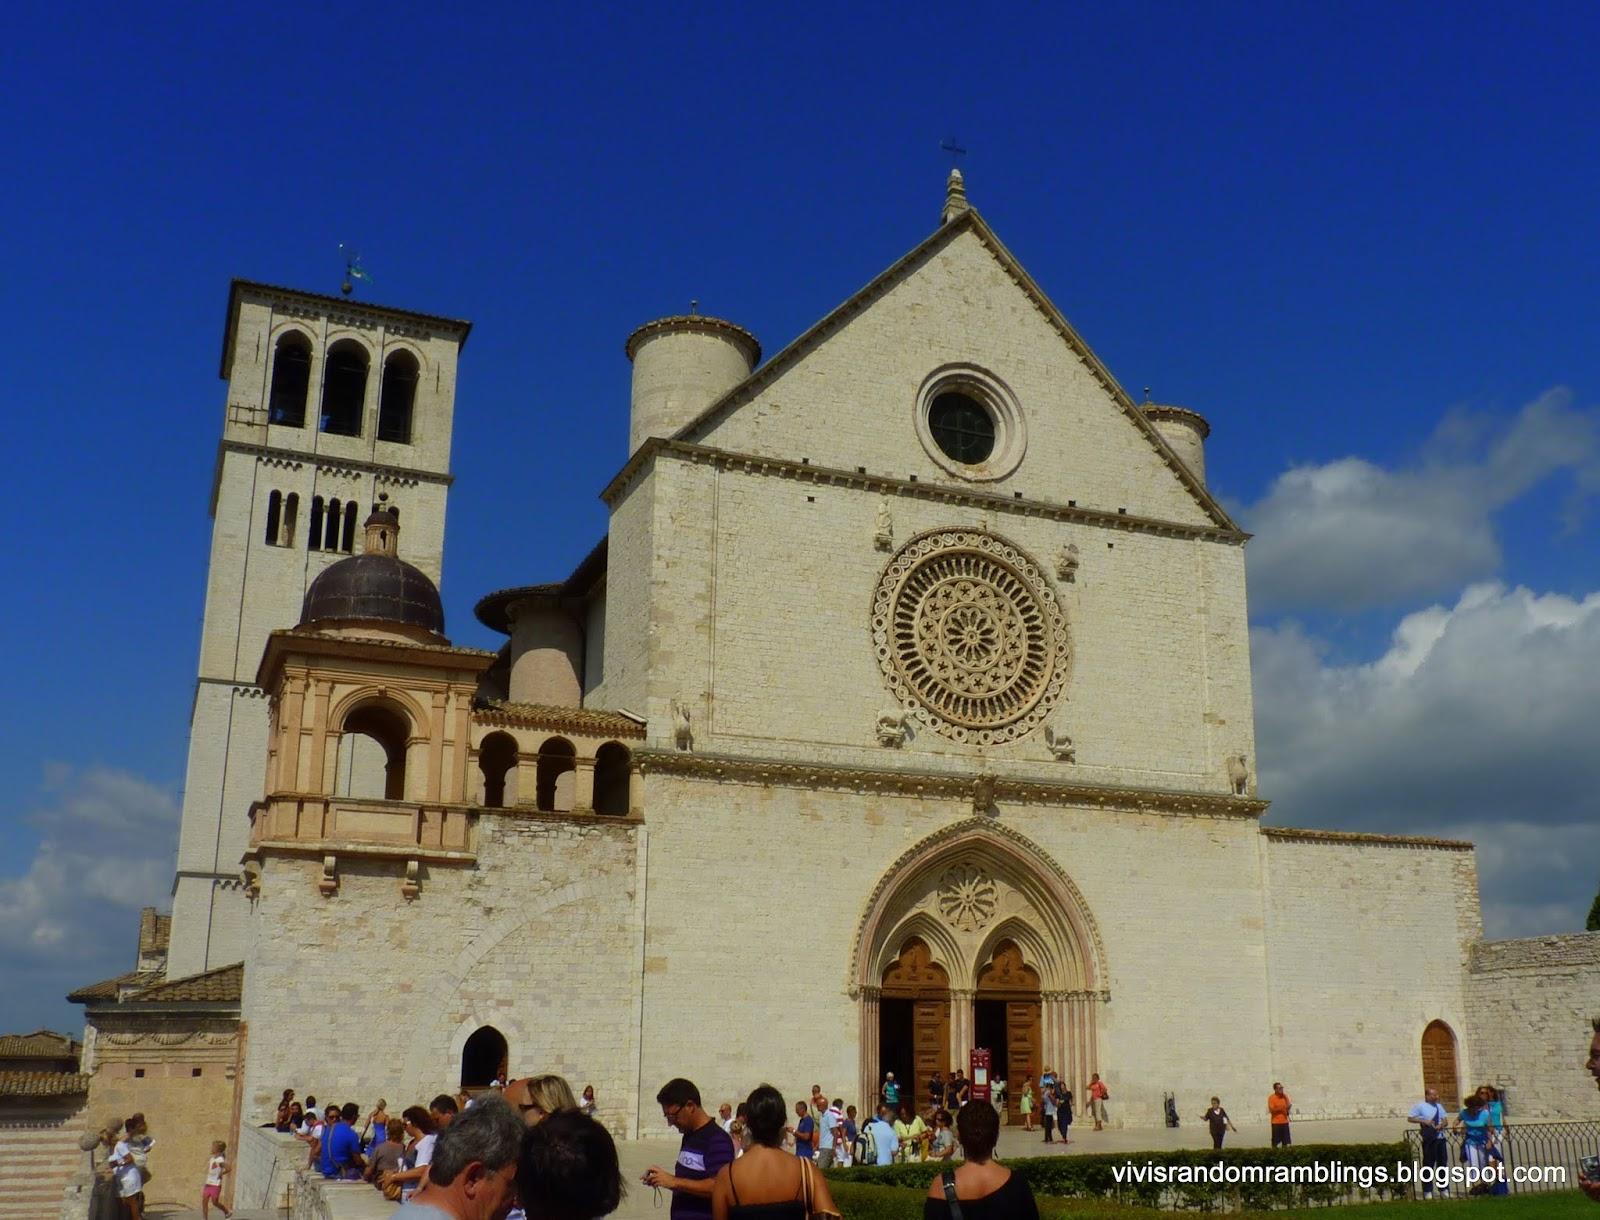 Basilica of Santa Maria degli Angeli (Saint Mary of Angels), Assisi